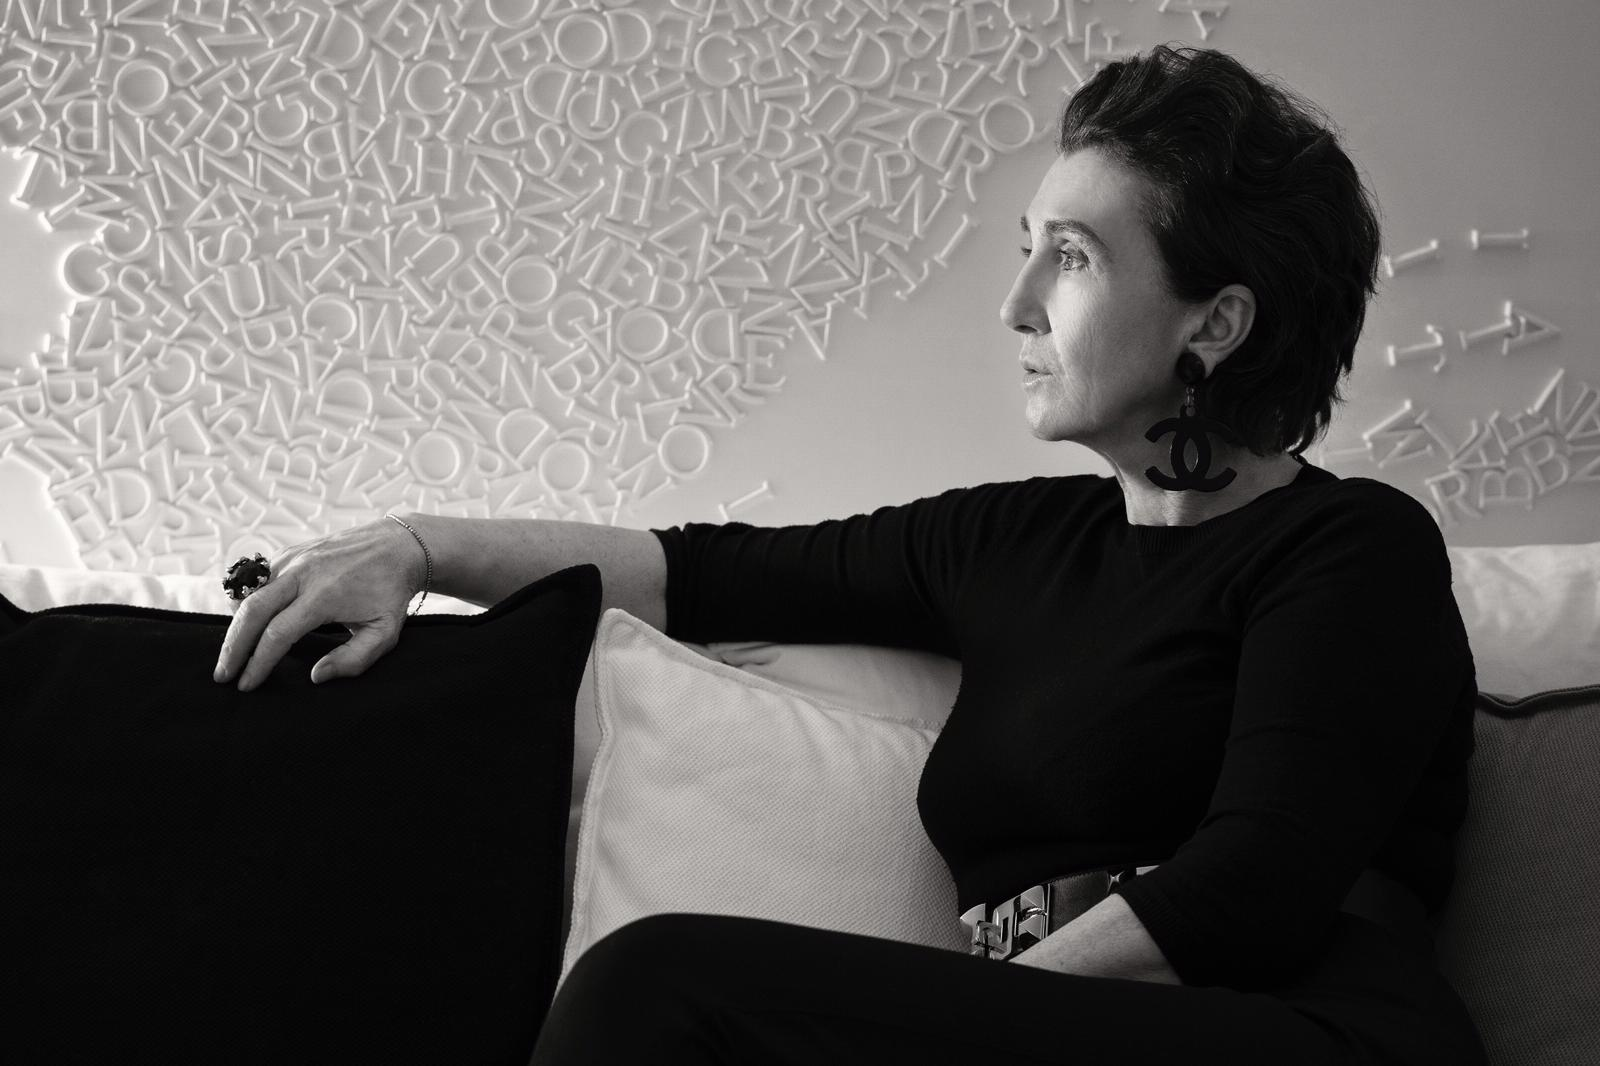 Gabriella Giamminola